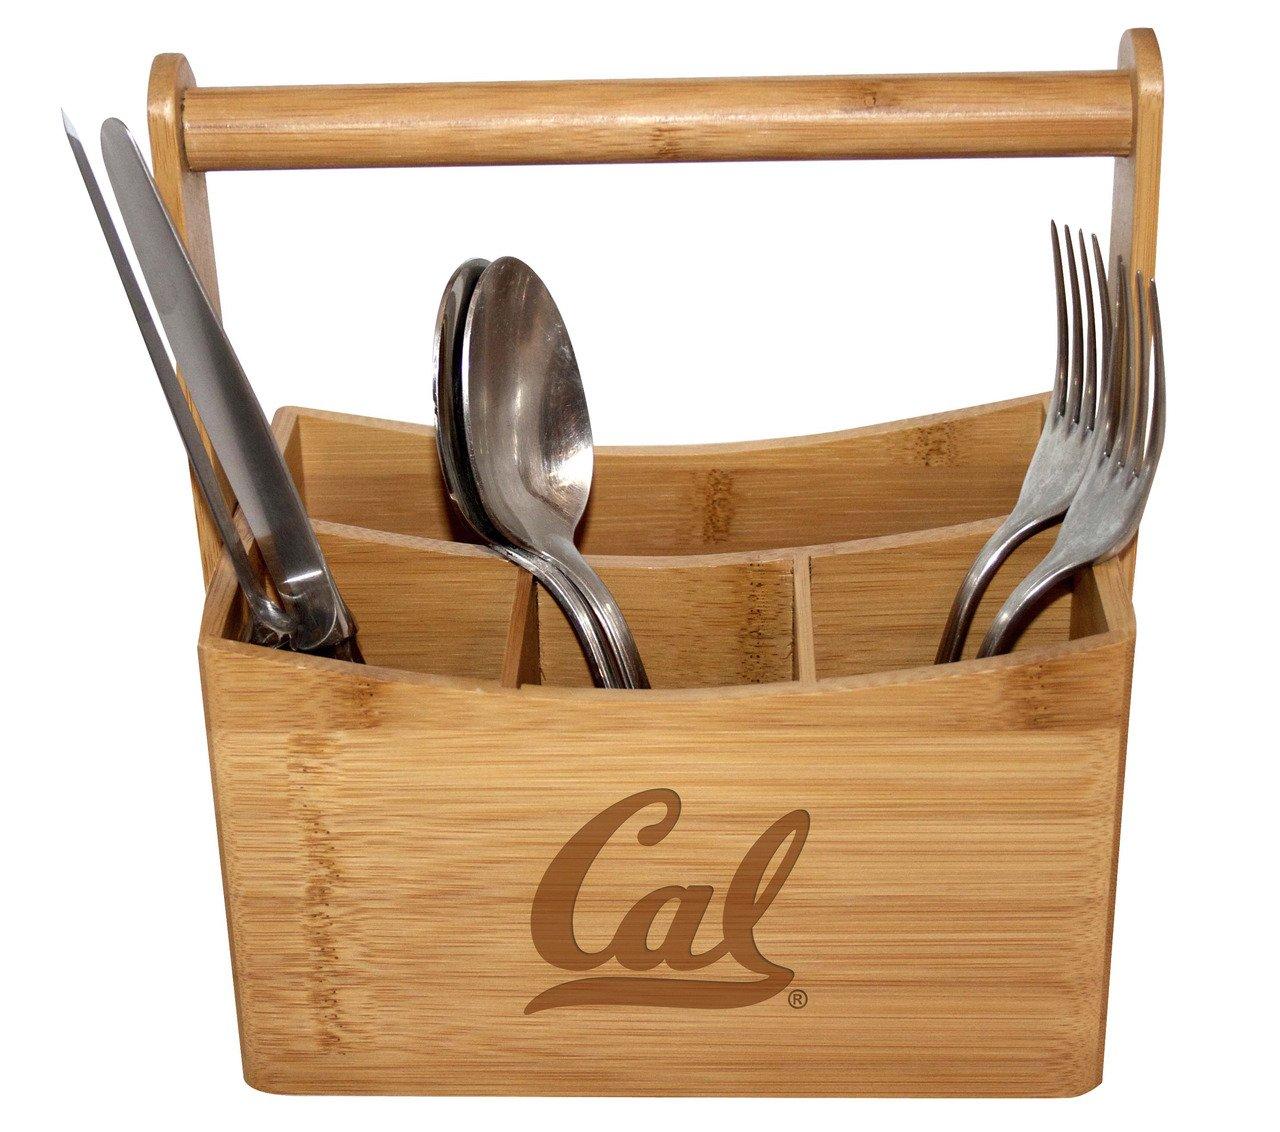 Cal Bamboo Caddy